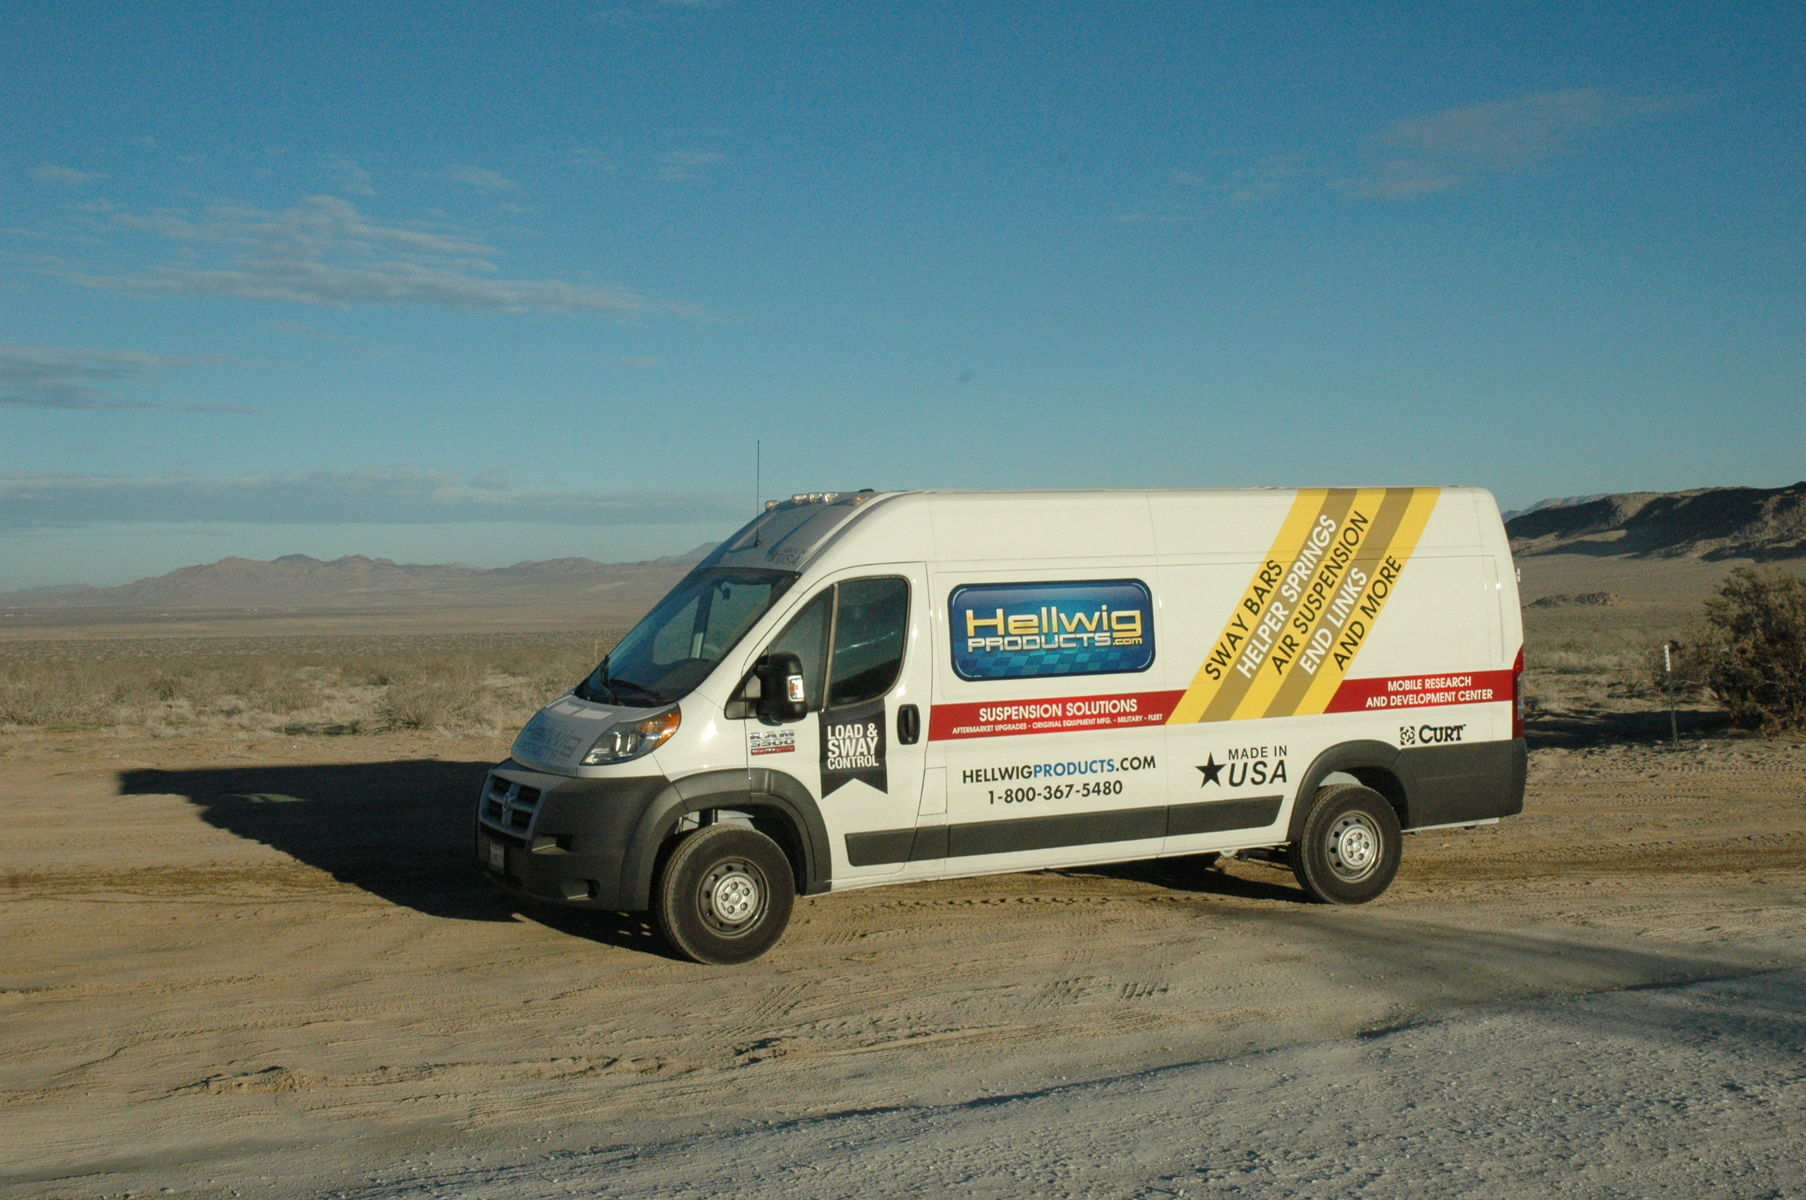 2014 Ram Promaster Cargo Van | Hellwig ProMaster